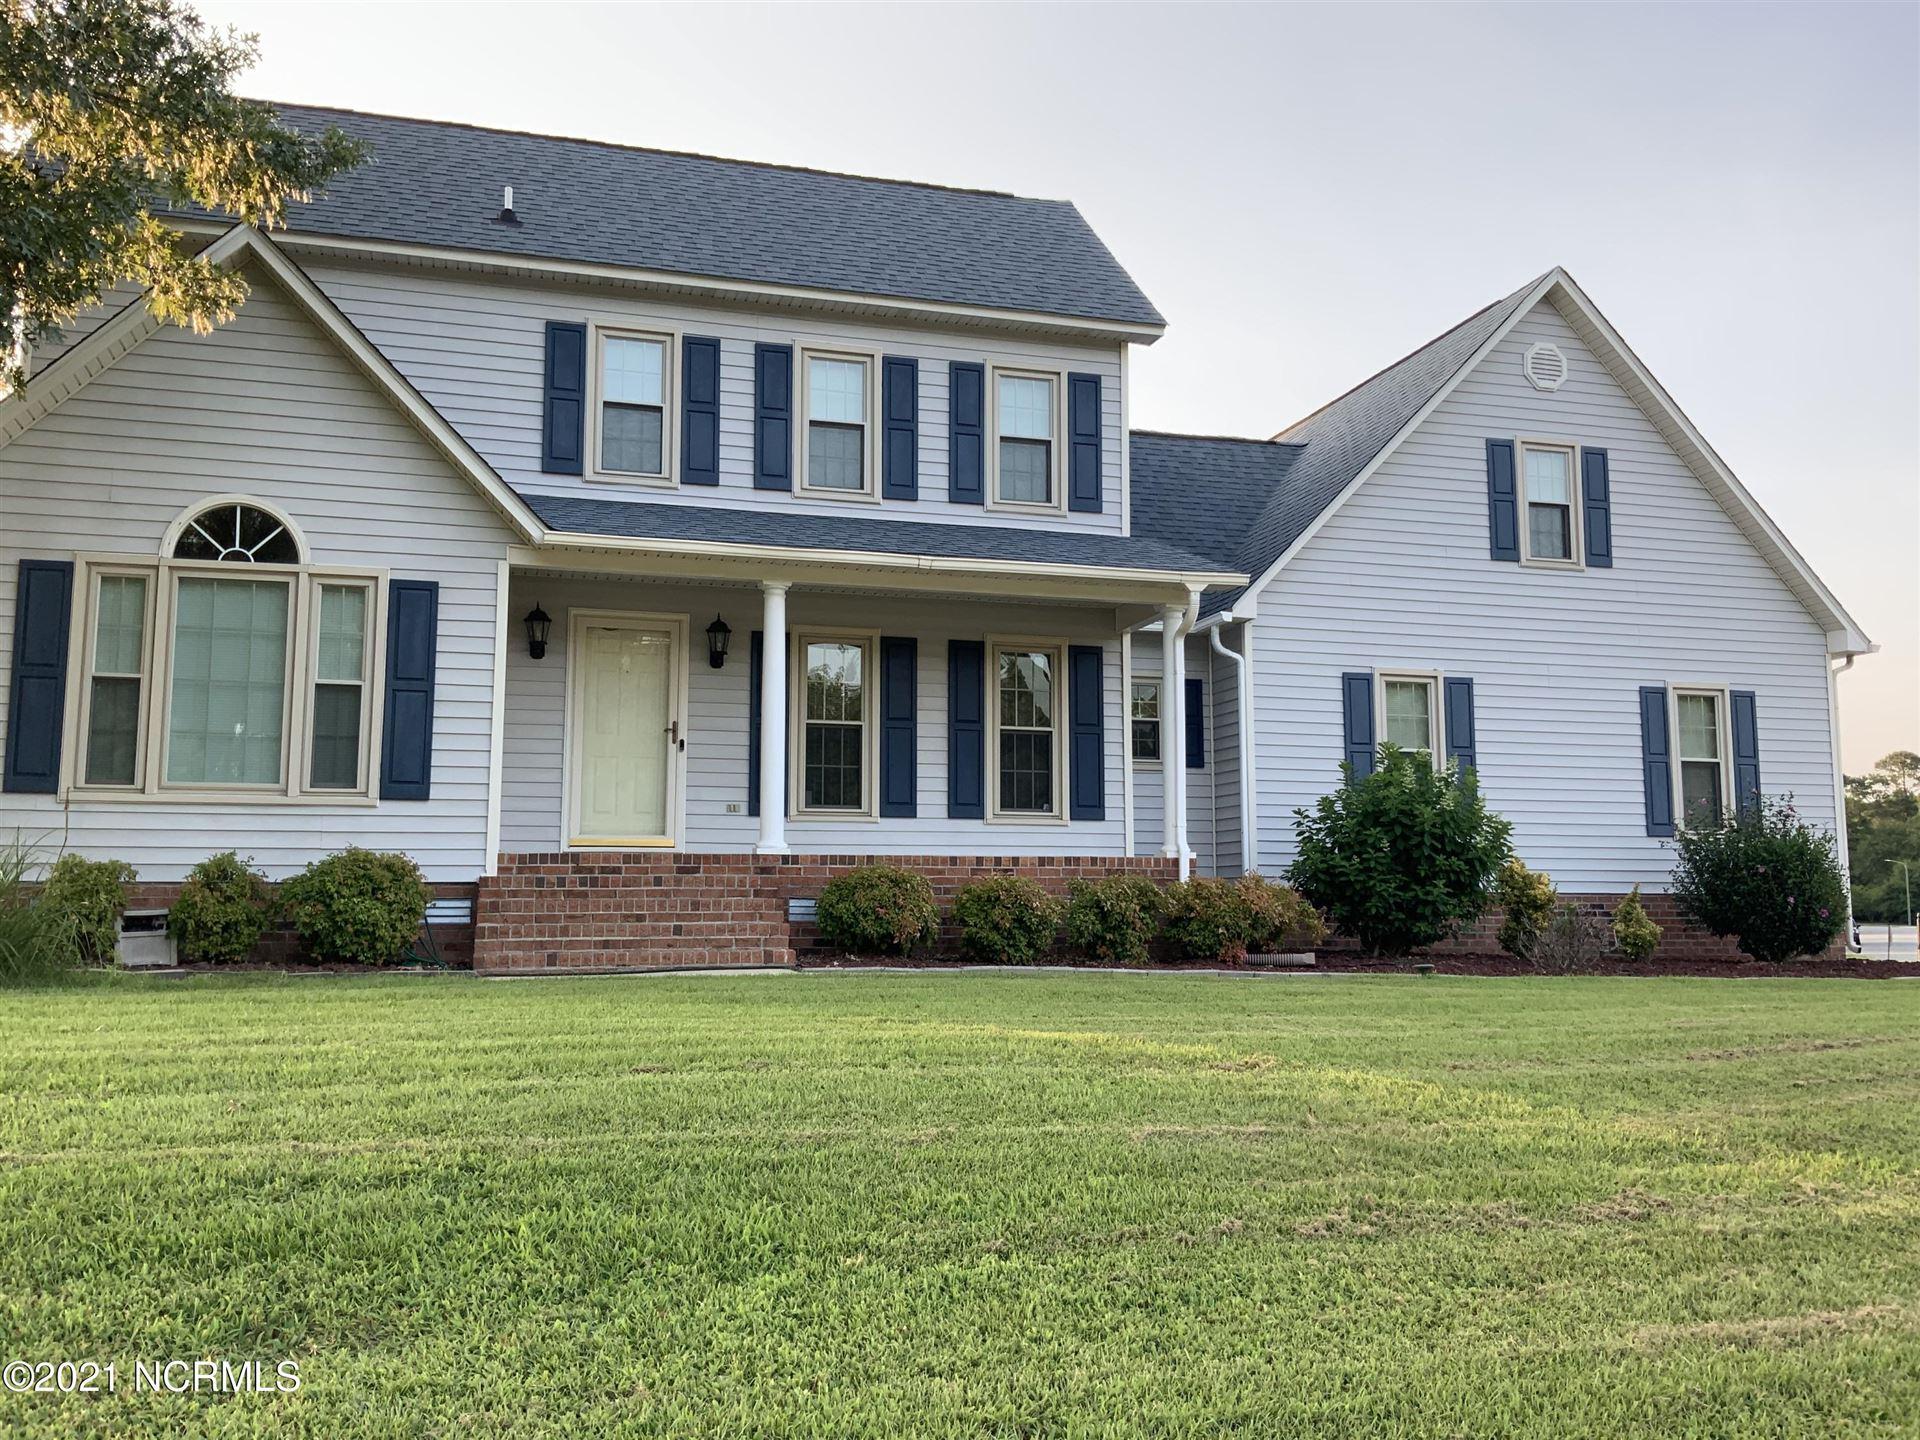 Photo of 859 Winterfield Drive, Winterville, NC 28590 (MLS # 100283280)